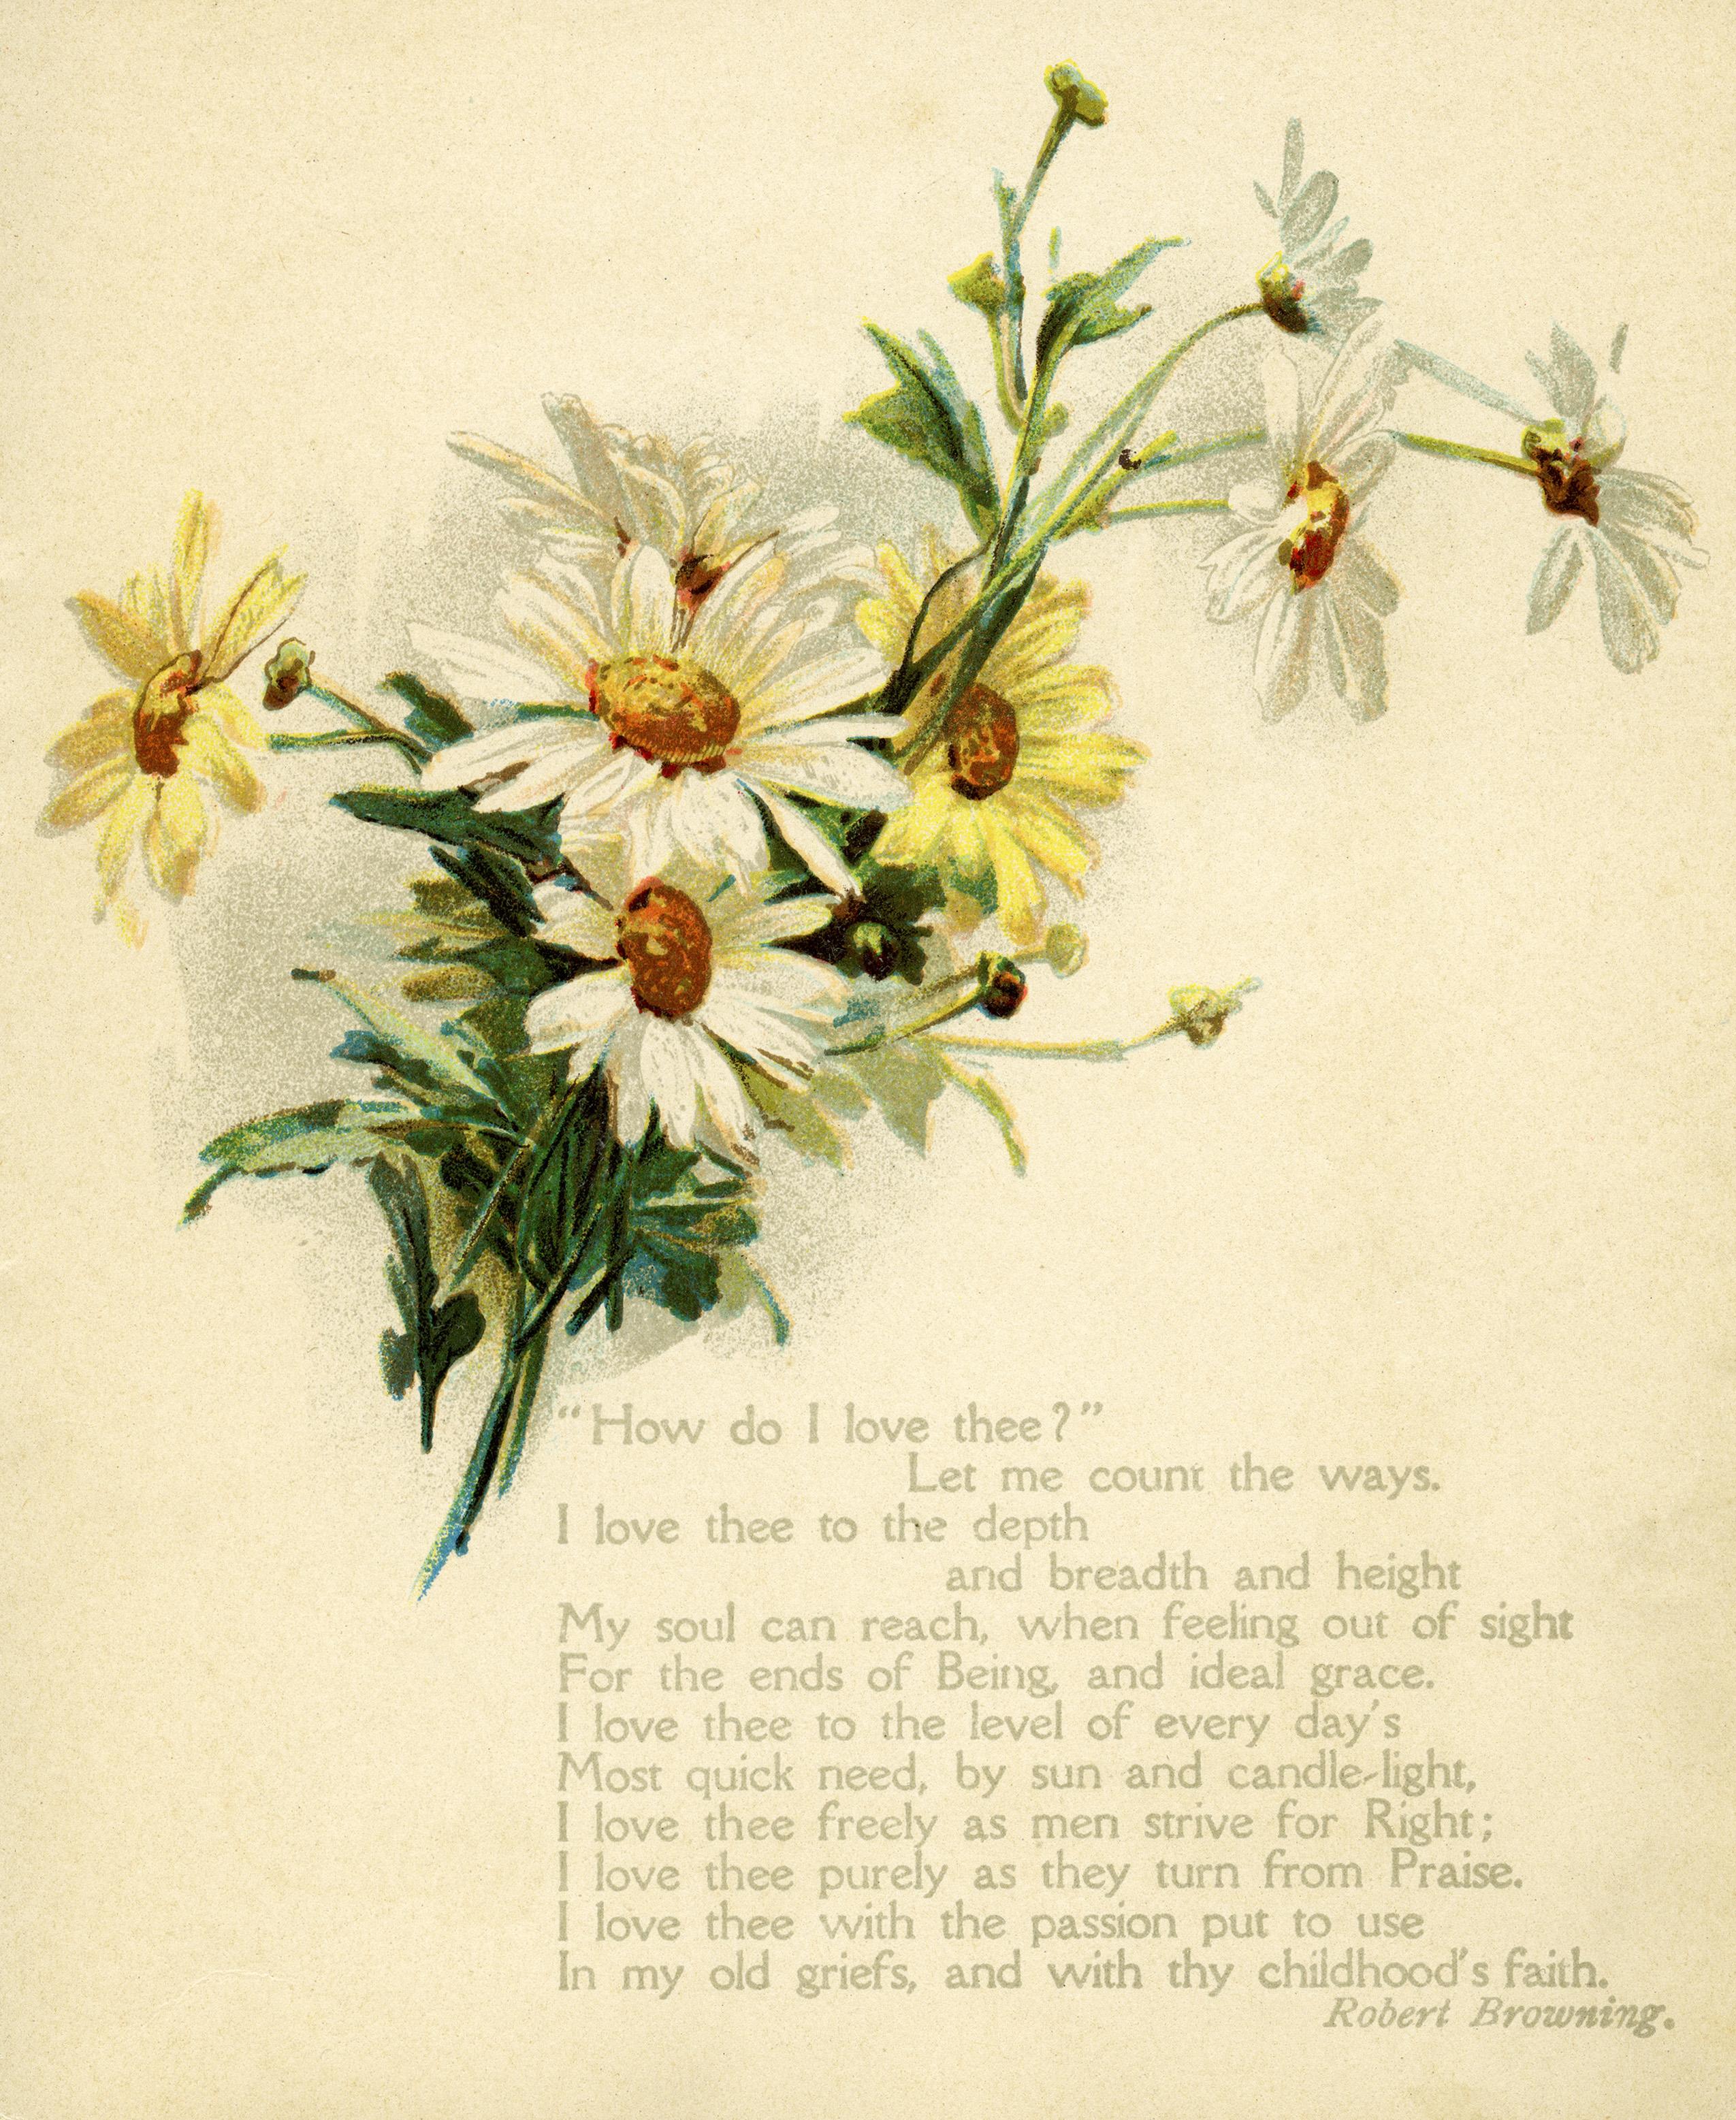 Free Vintage Image Daisies And Love Poem Old Design Shop Blog